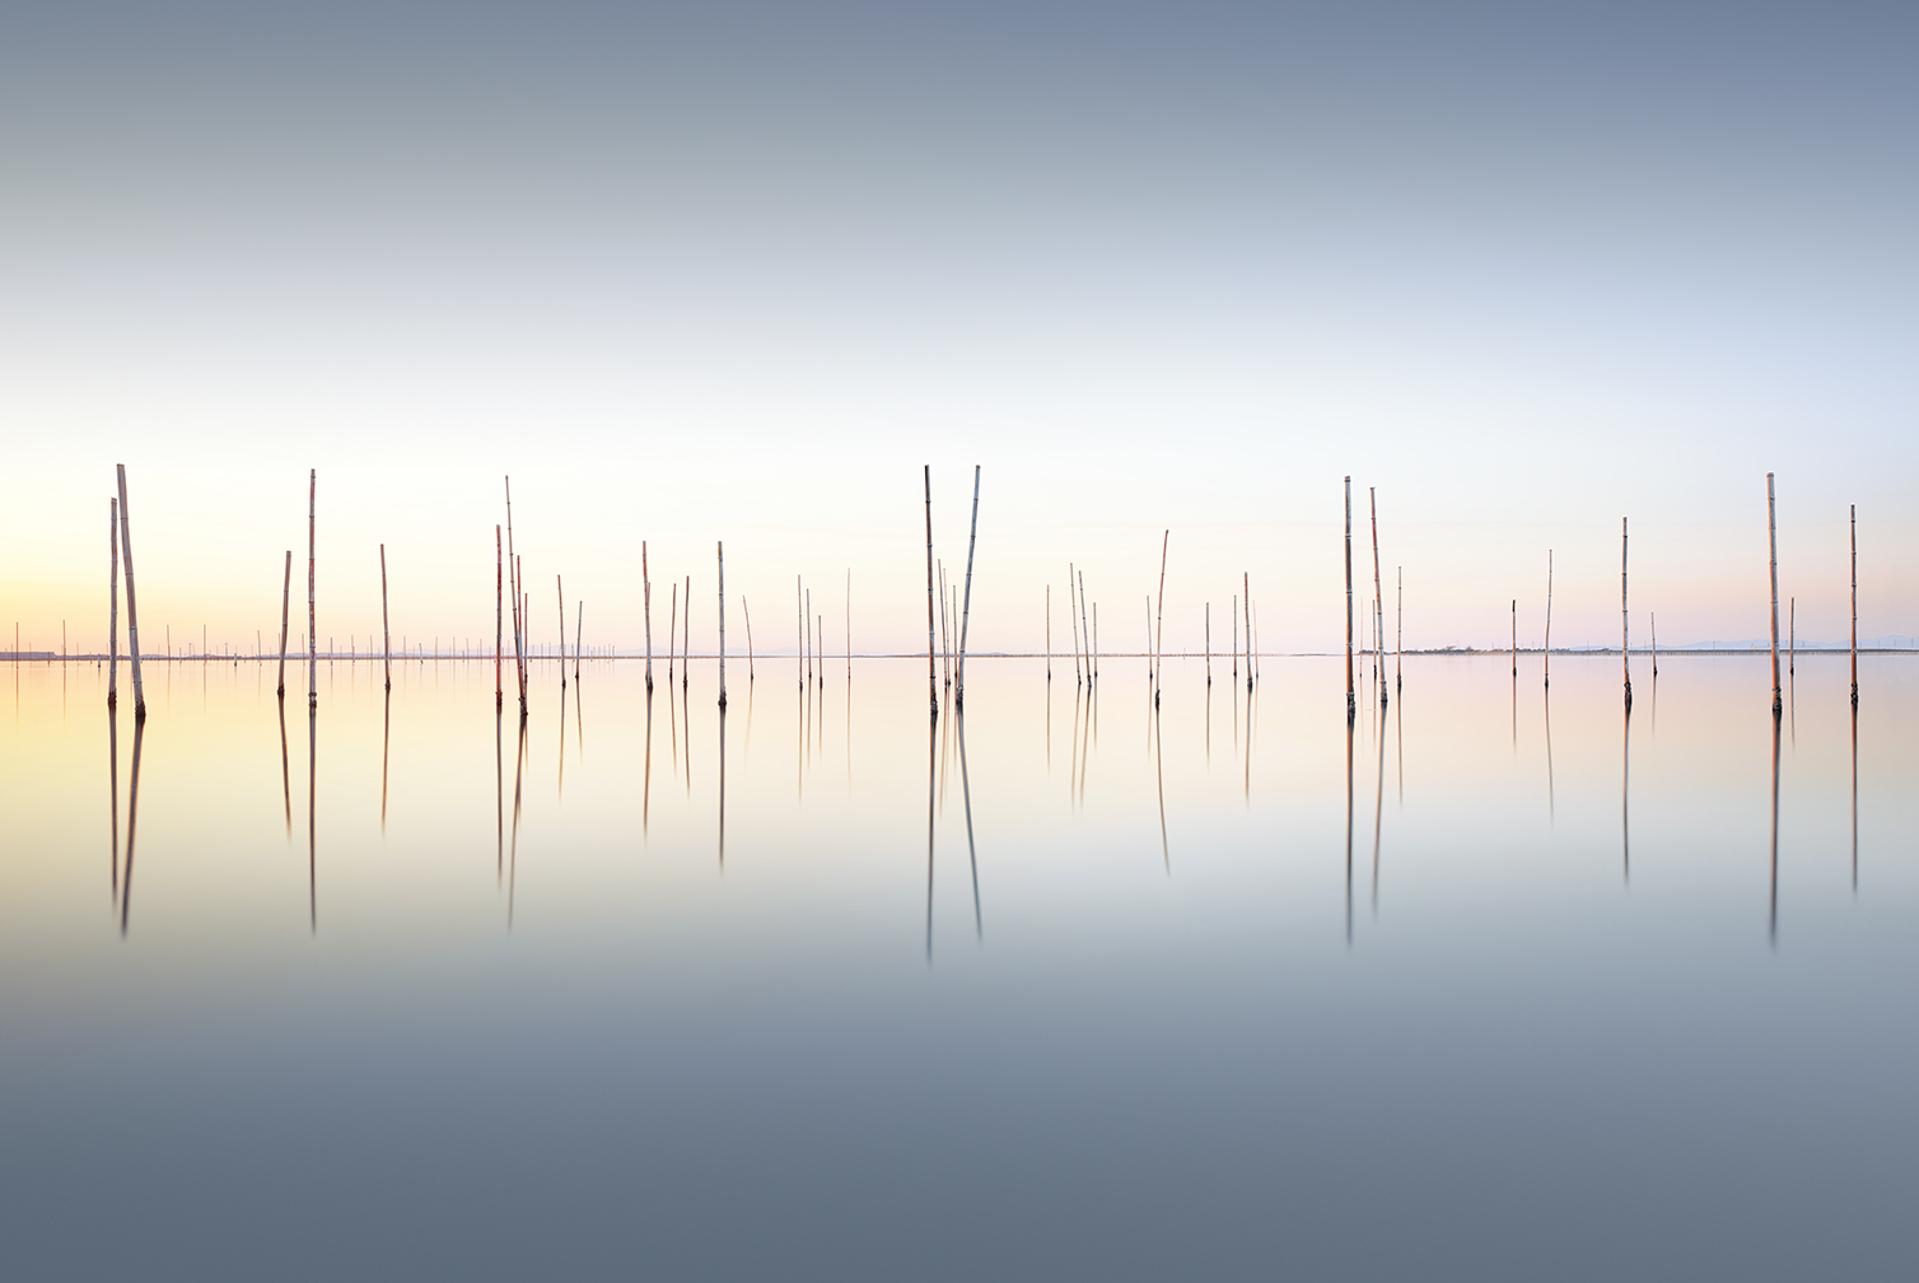 Last Light by Michael Levin